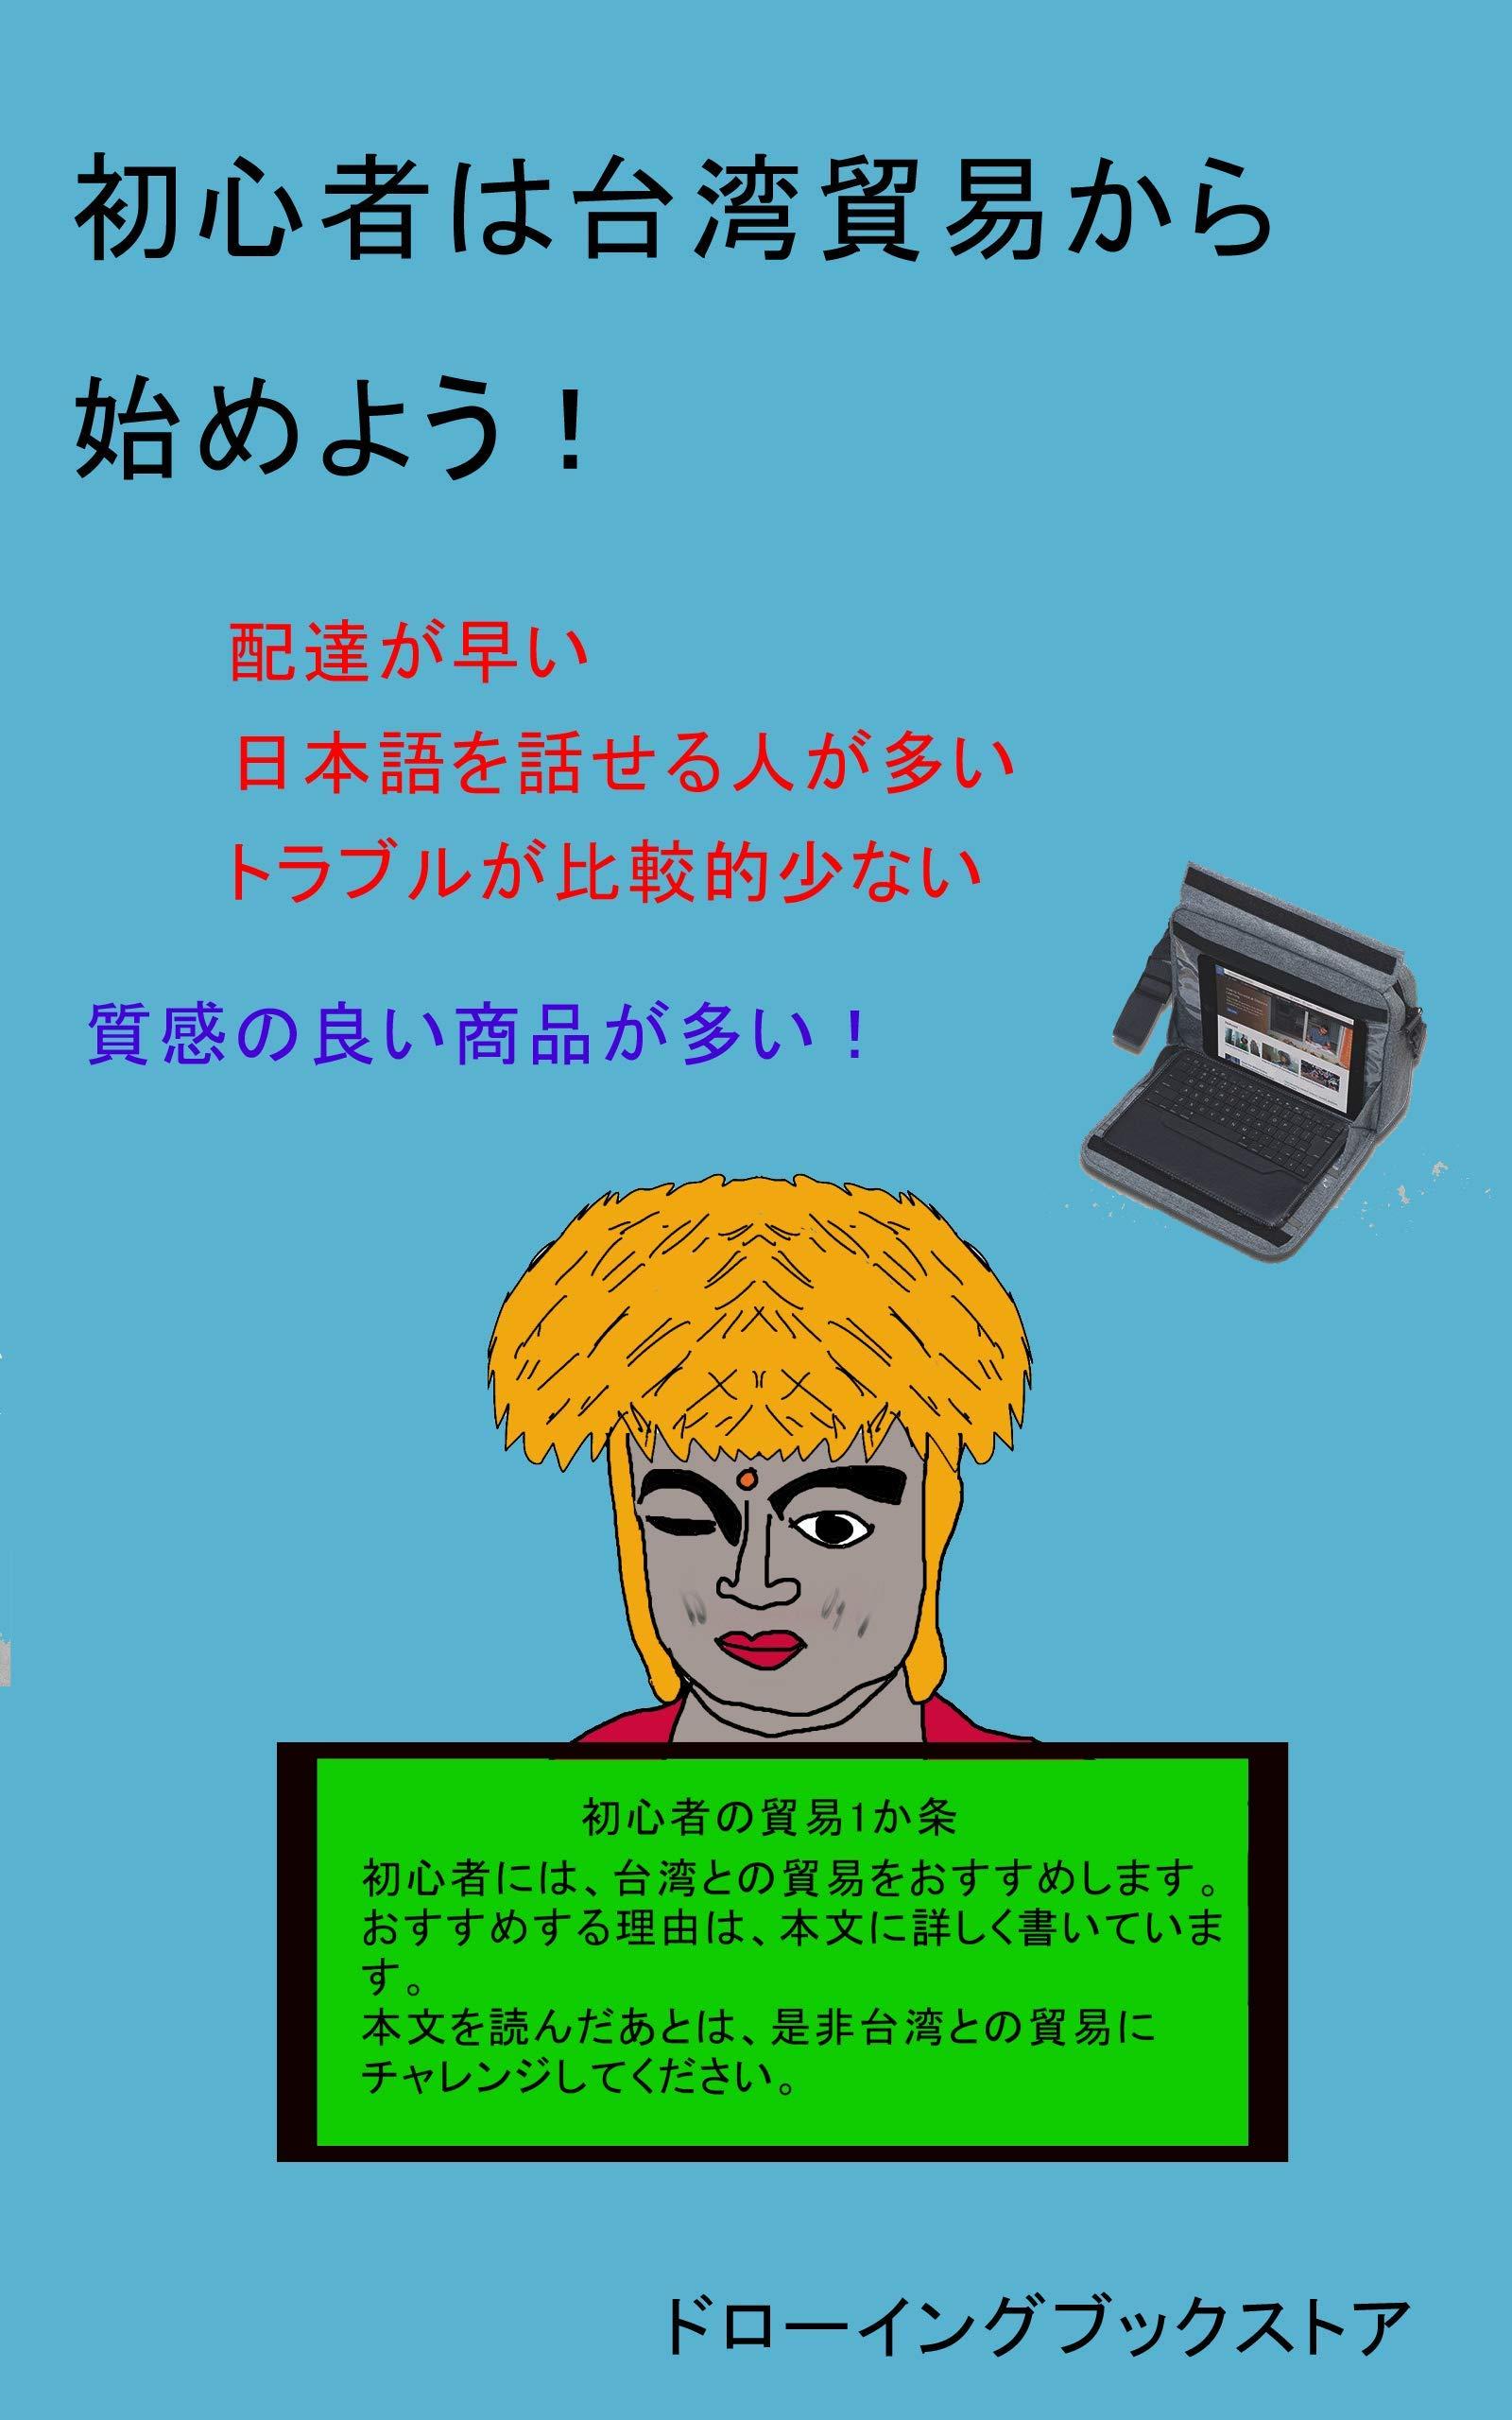 syoshinsyahataiwanbouekikarahajimeyou: taiwannihamiryokutekinasyouhinngaippai (jituyouhon) (Japanese Edition)